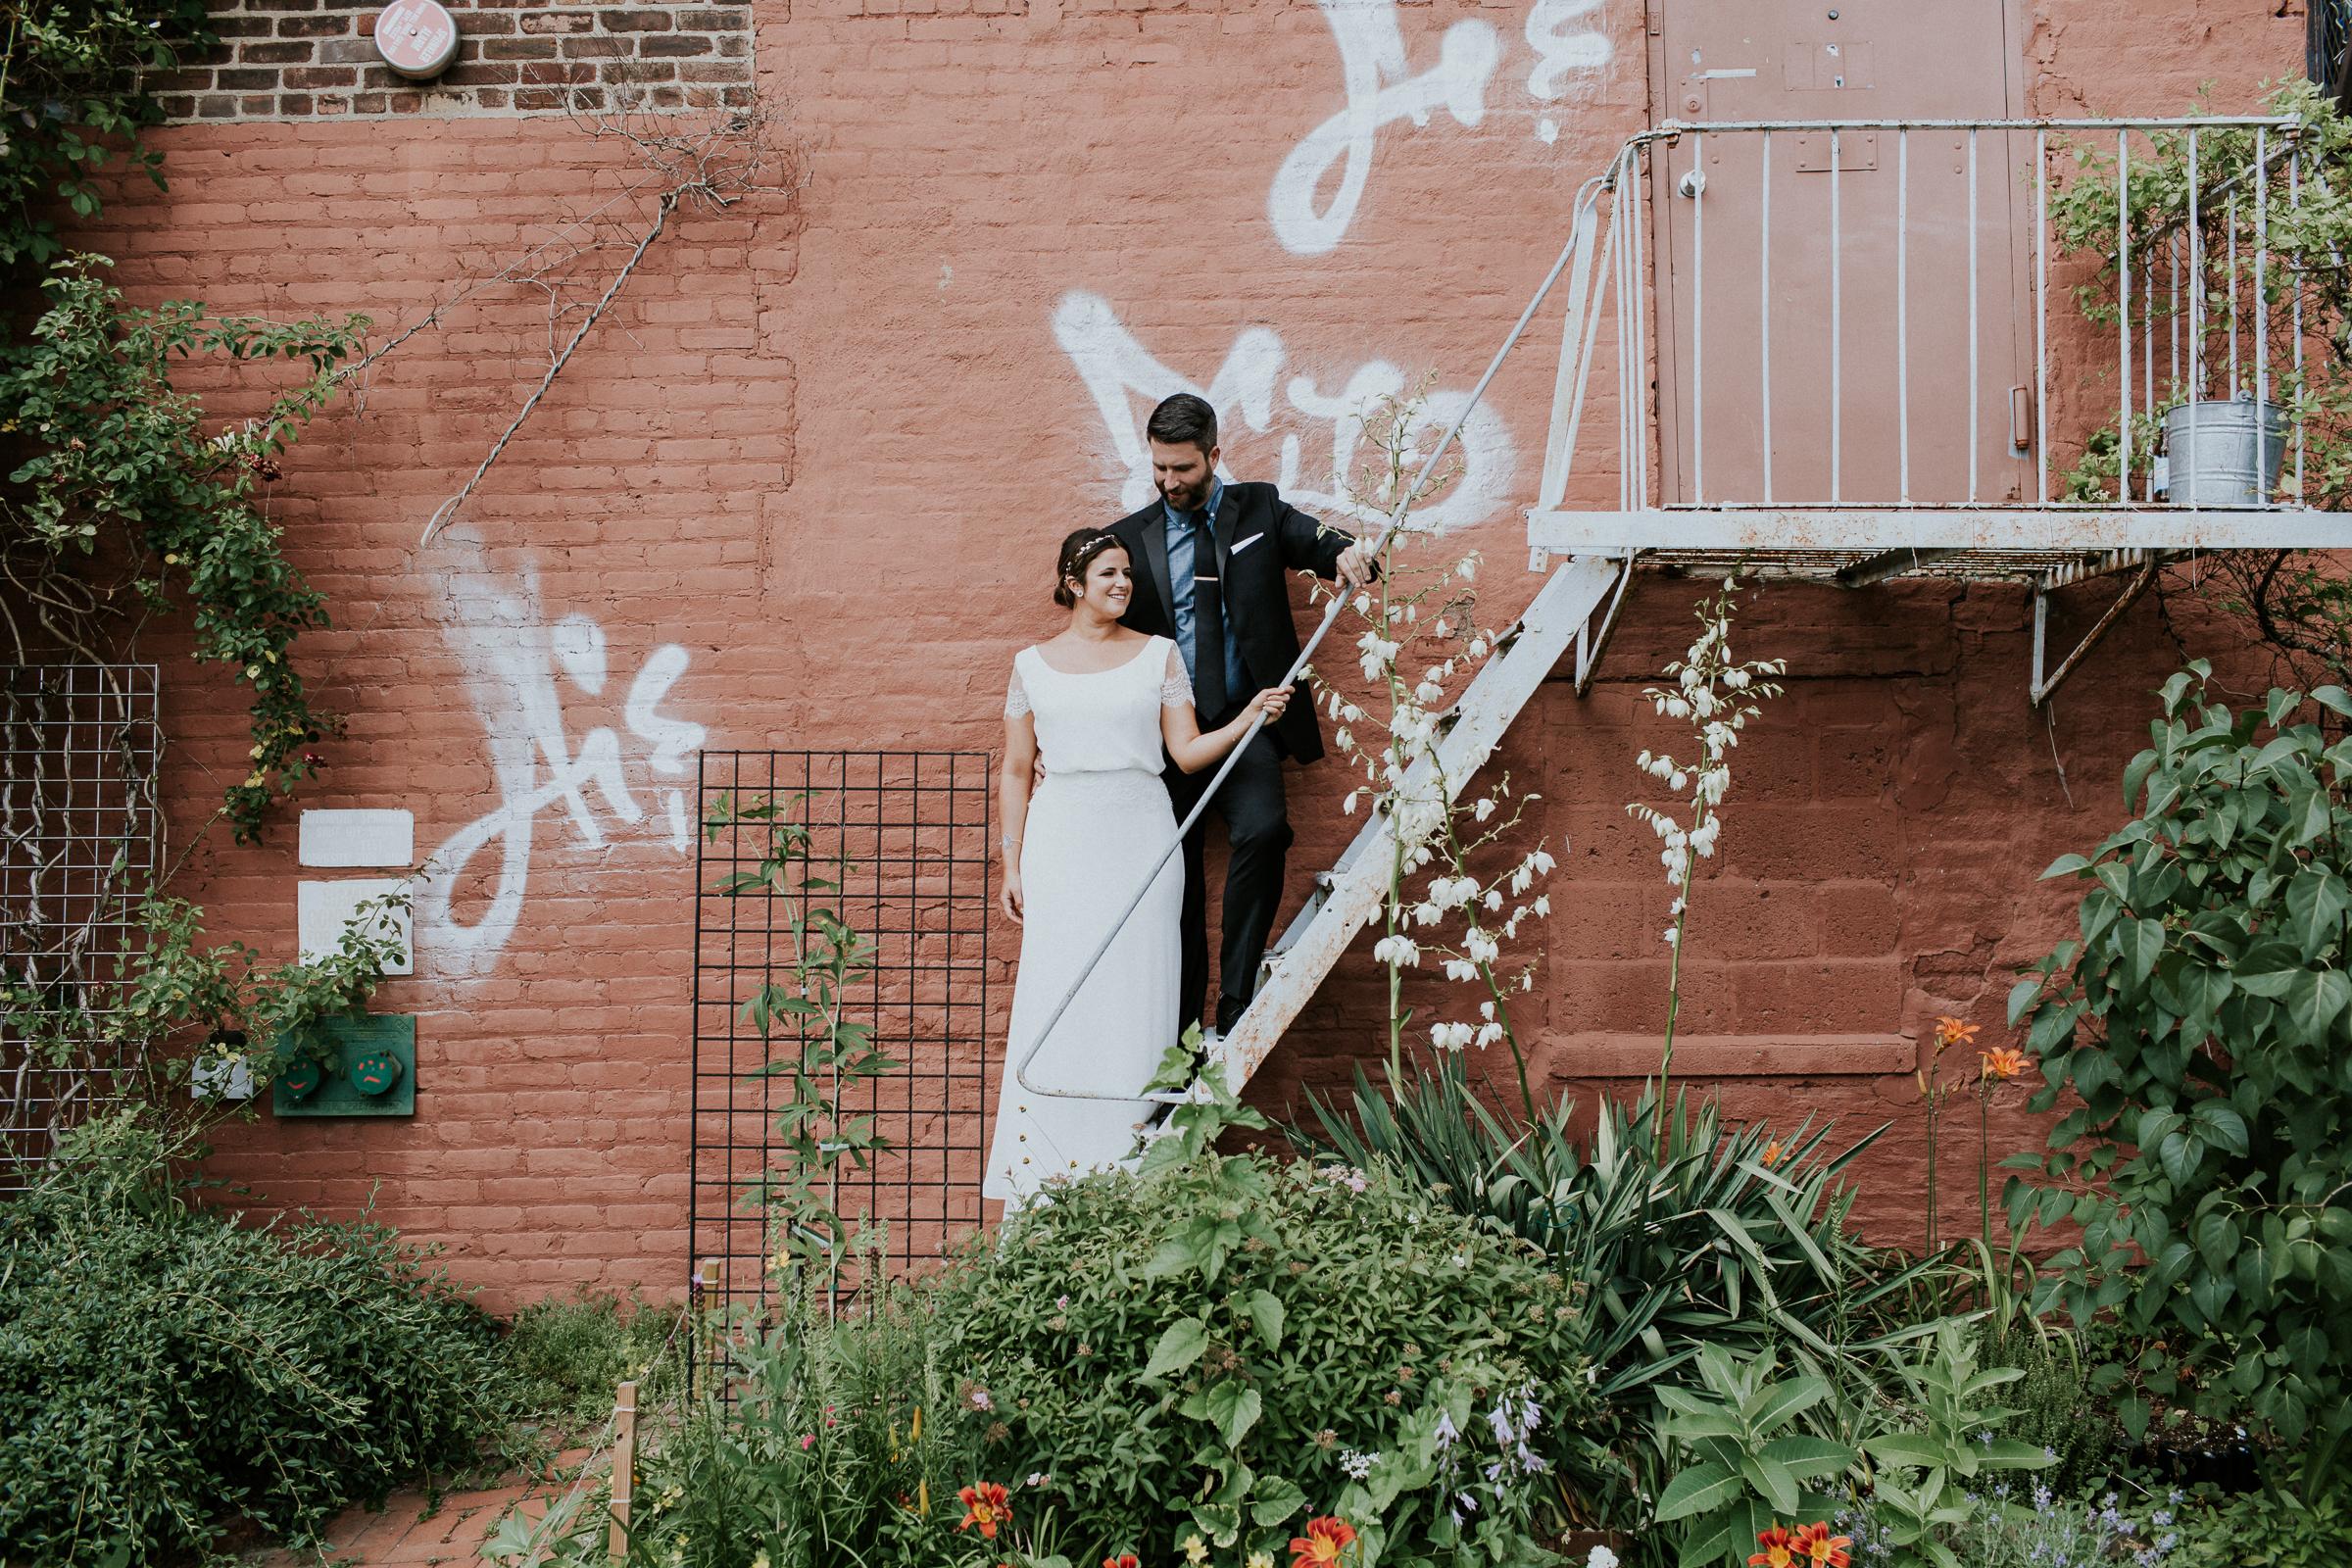 New-York-Documentary-Wedding-Photography-Best-Of-2017-by-Elvira-Kalviste-Photography-37.jpg